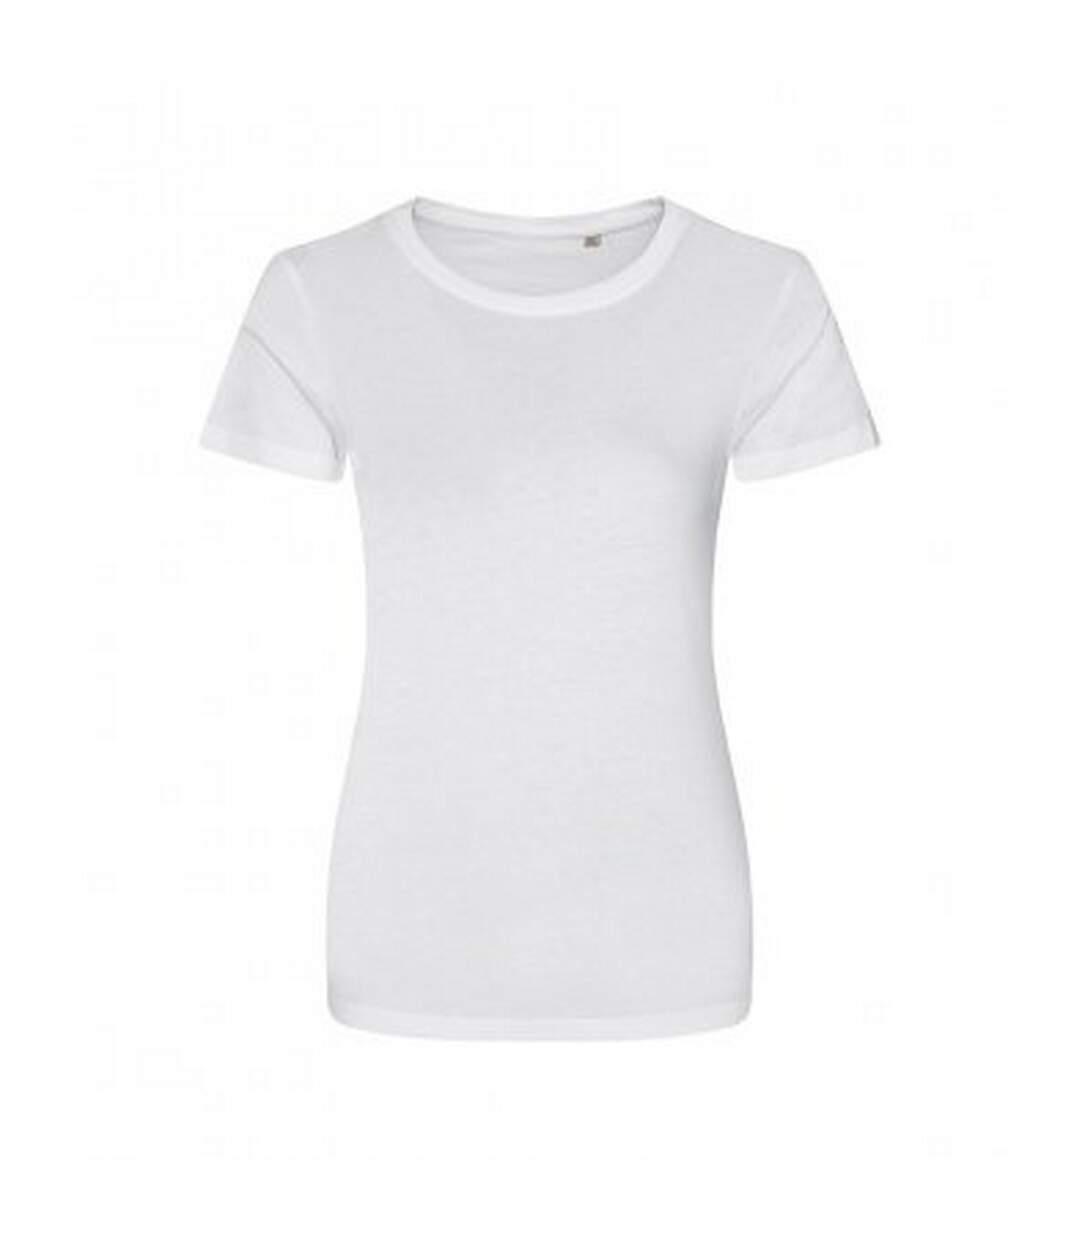 Ecologie - T-Shirt - Femme (Blanc) - UTPC3191